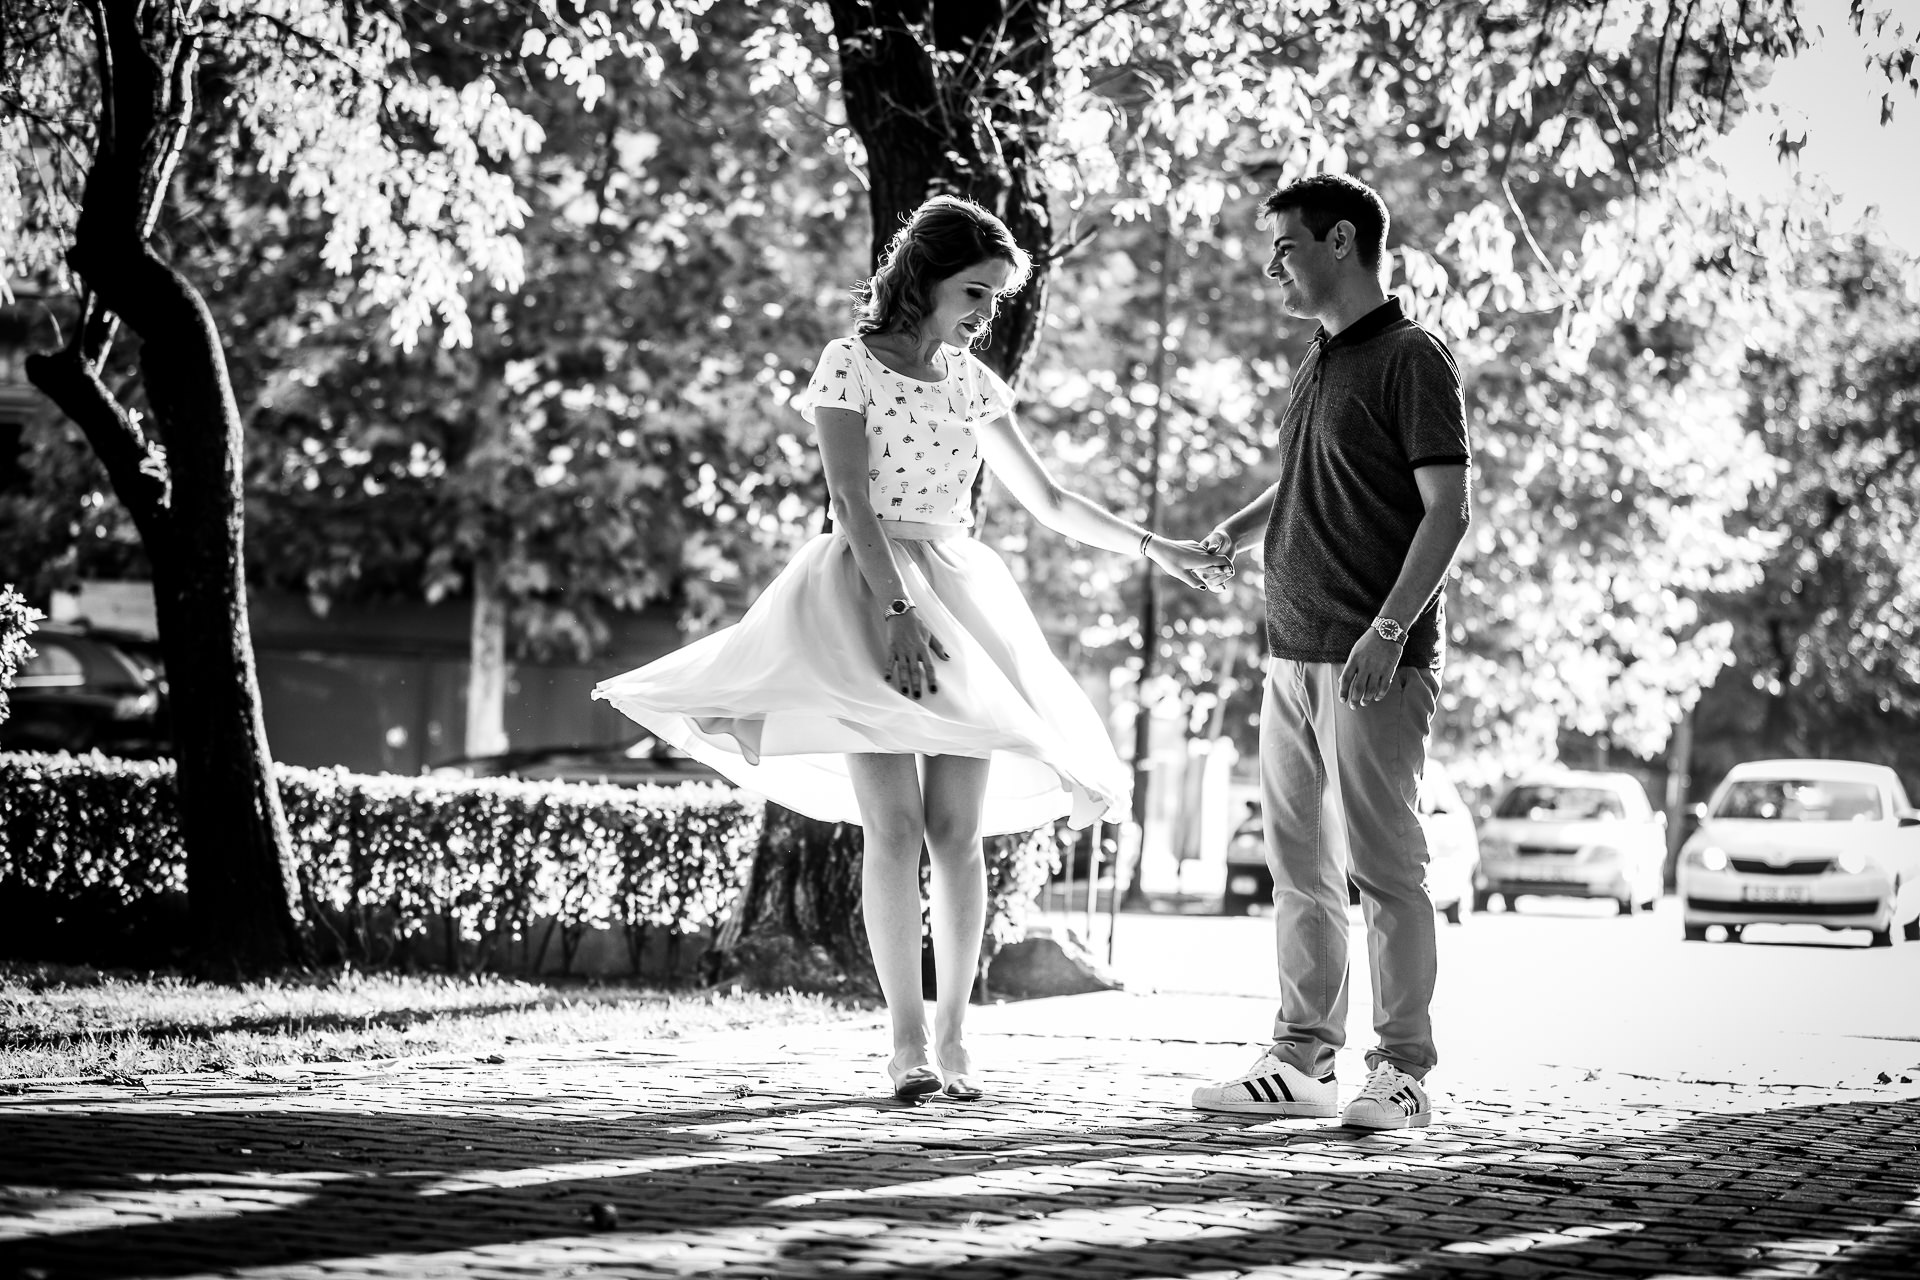 Sedinta foto Dorobanti / Strada Paris - Mihai Zaharia Photography - 09